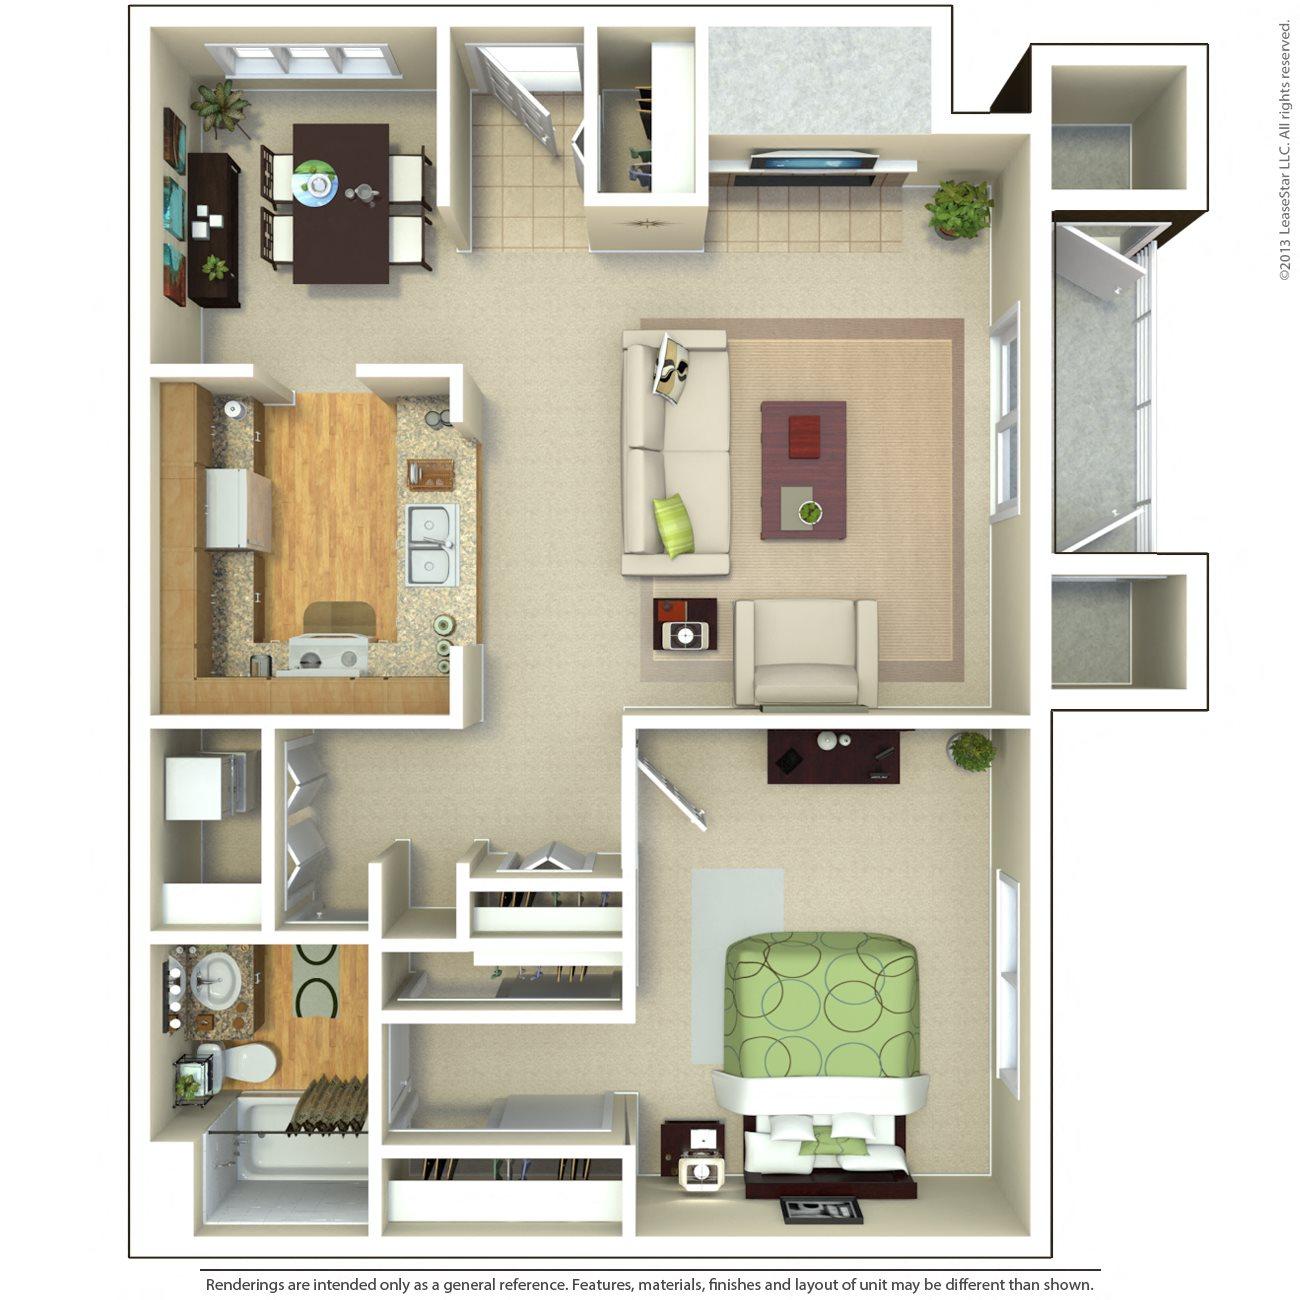 Knobs Pointe Apartments: Rush River Apartments EBrochure